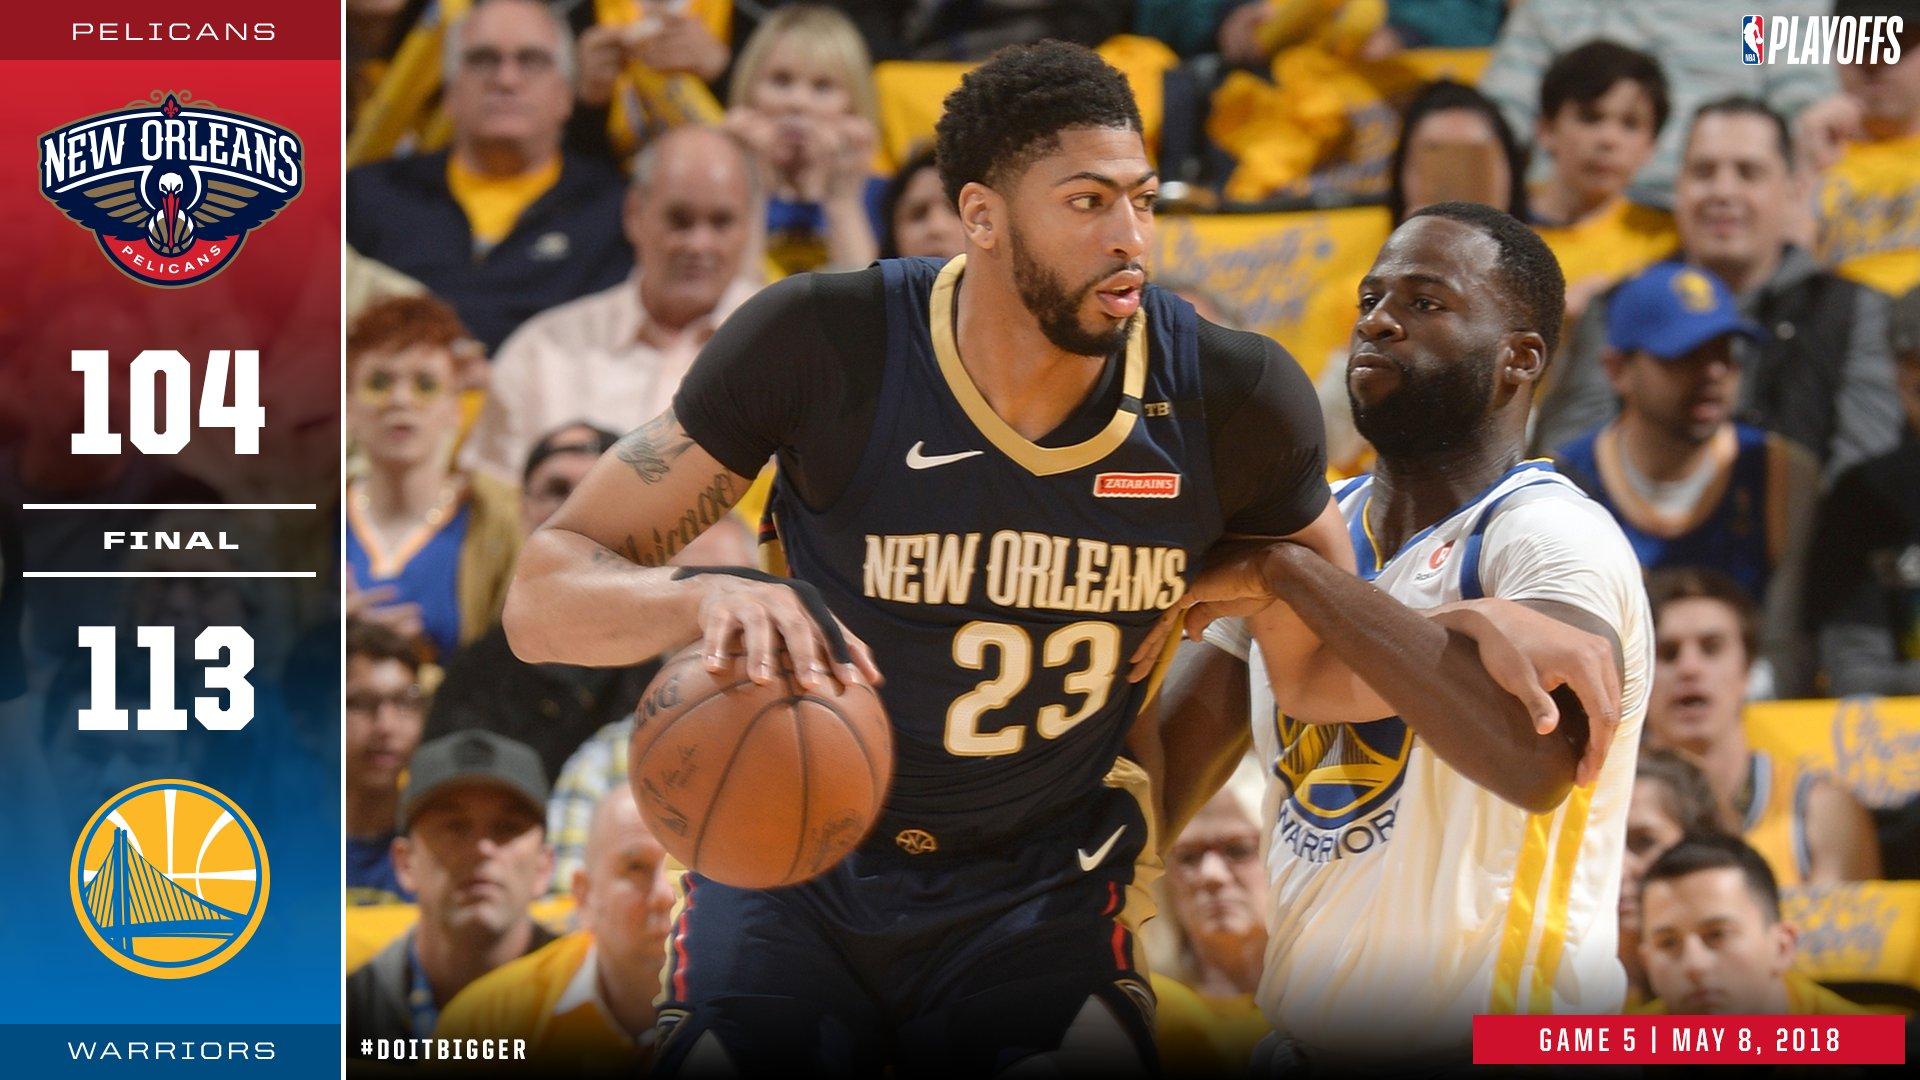 #Pelicans season ends in Oakland   Salute @Warriors   #NBAPlayoffs https://t.co/Ol8MaYwSy6